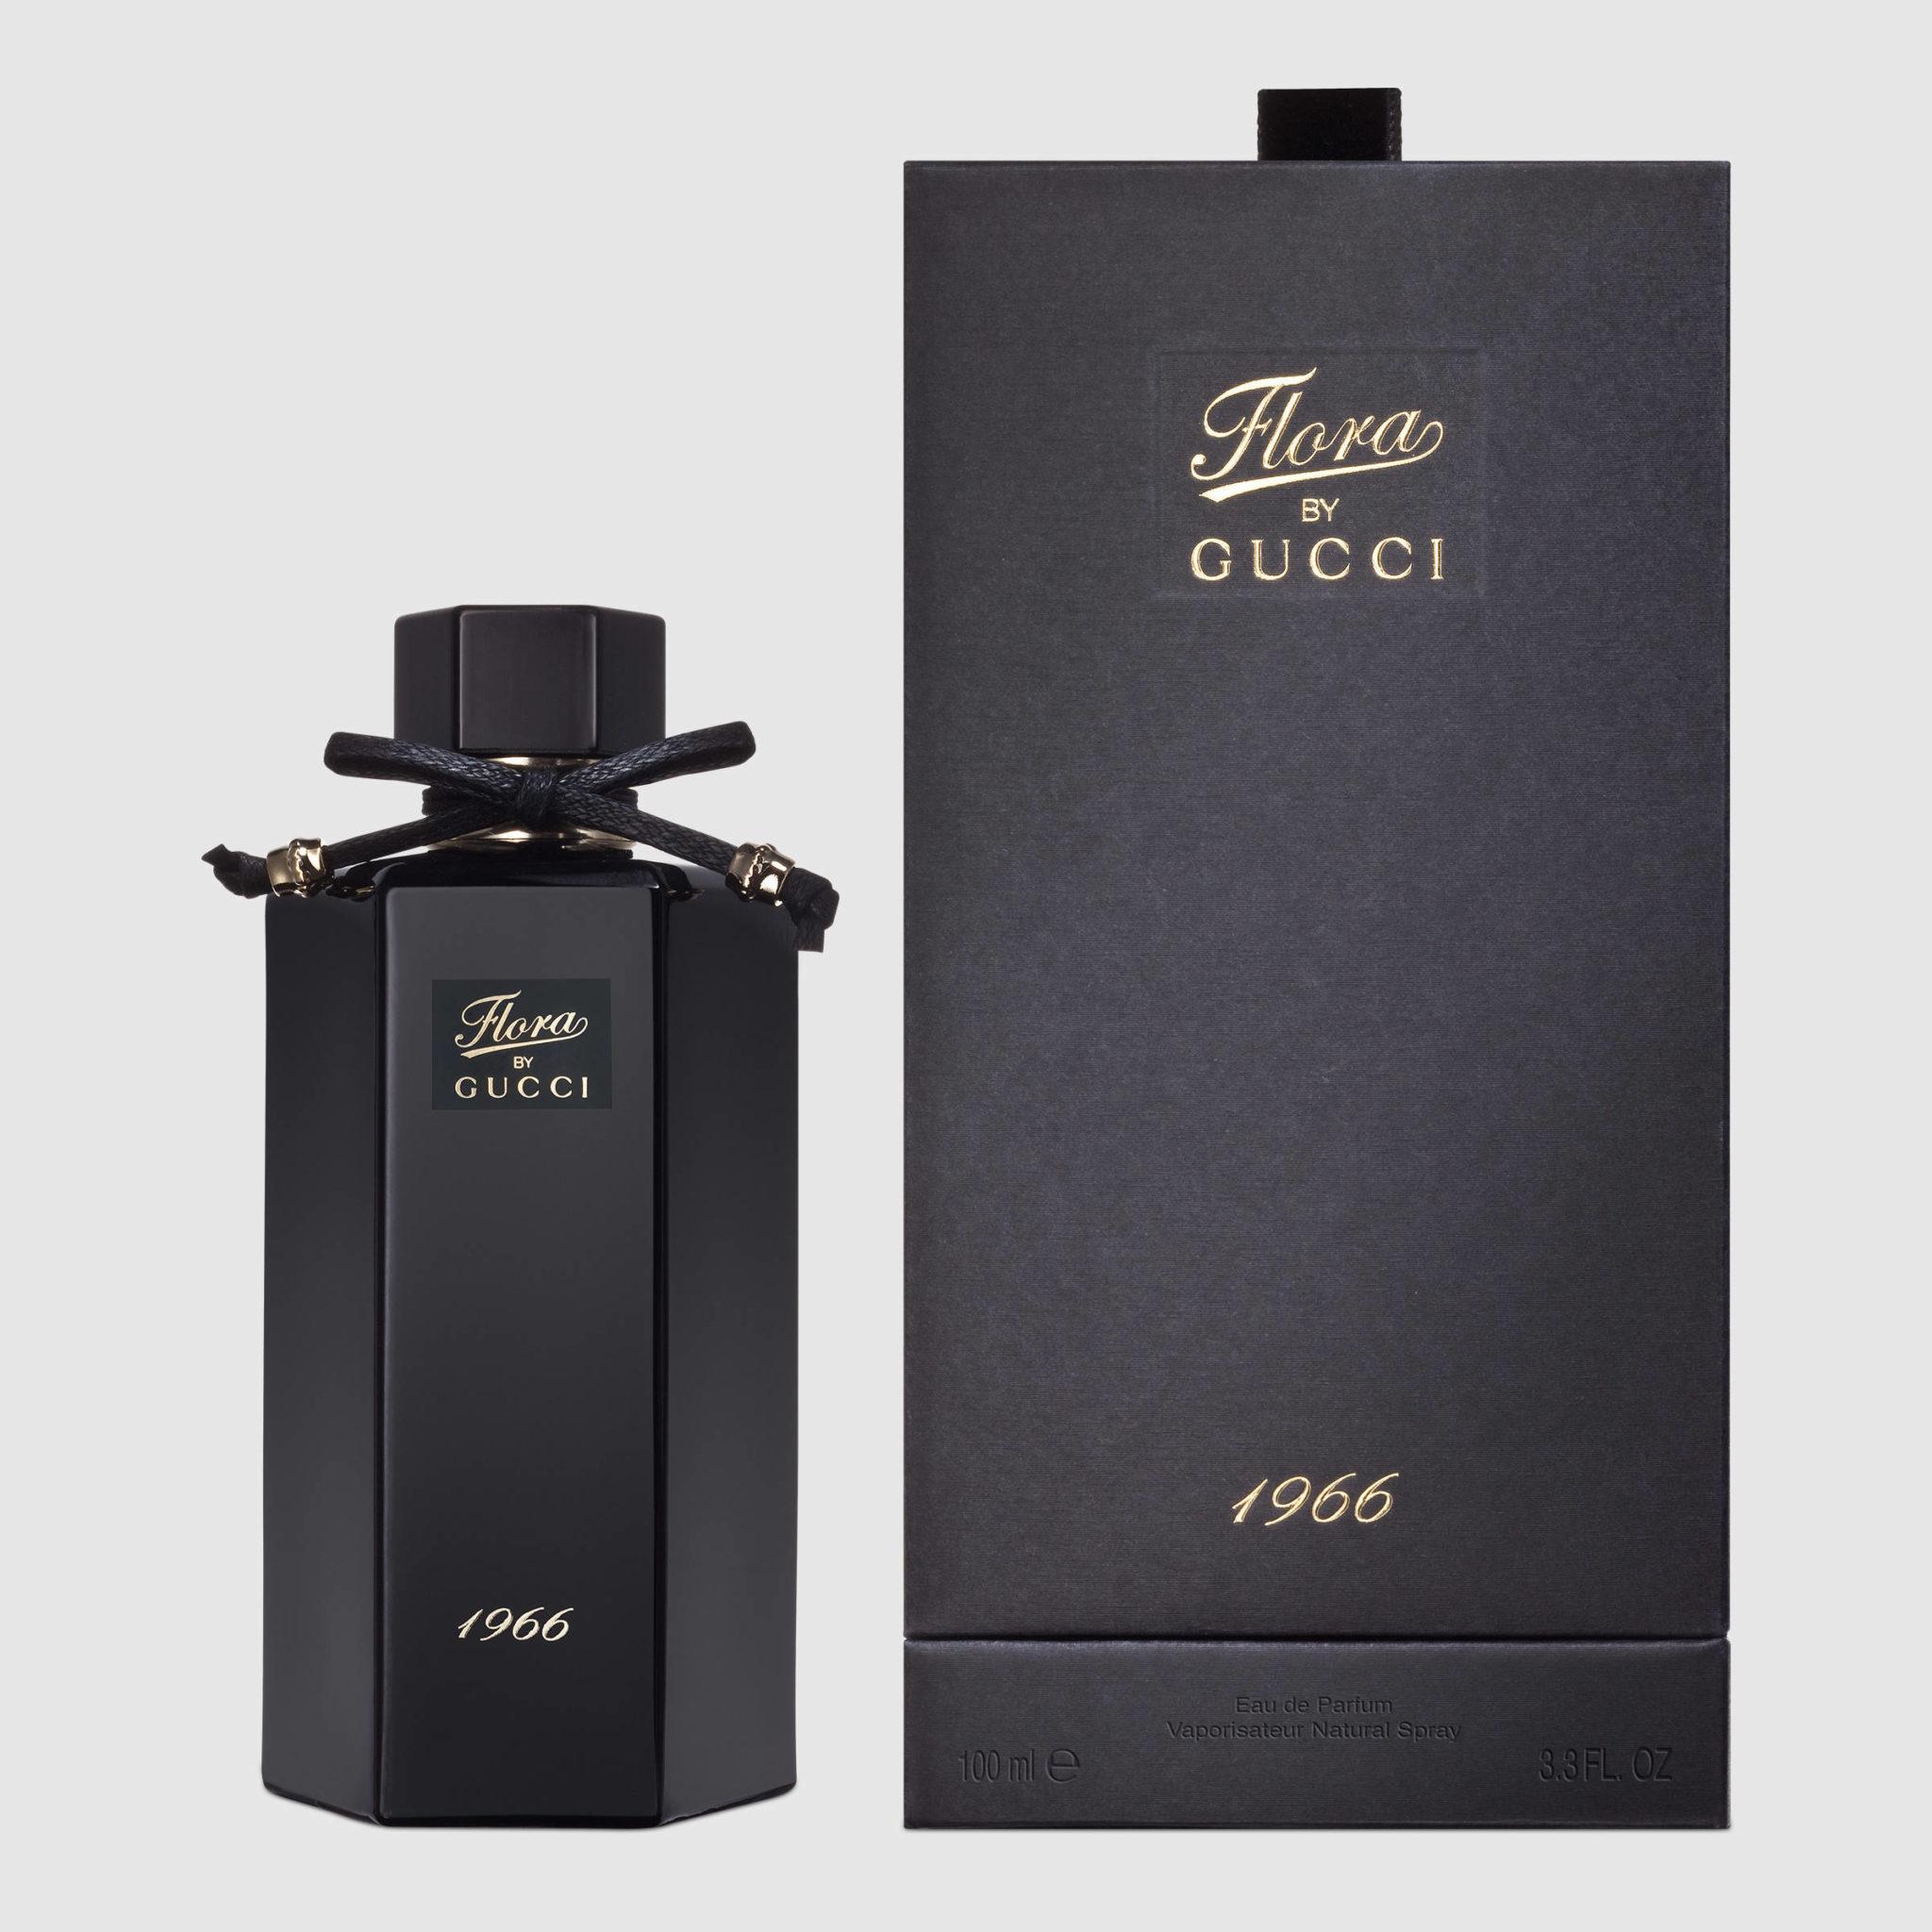 fdeb94ac1 گوچی فلورا بای گوچی ۱۹۶۶ Gucci Flora by Gucci 1966 - فروشگاه عطر الیسا